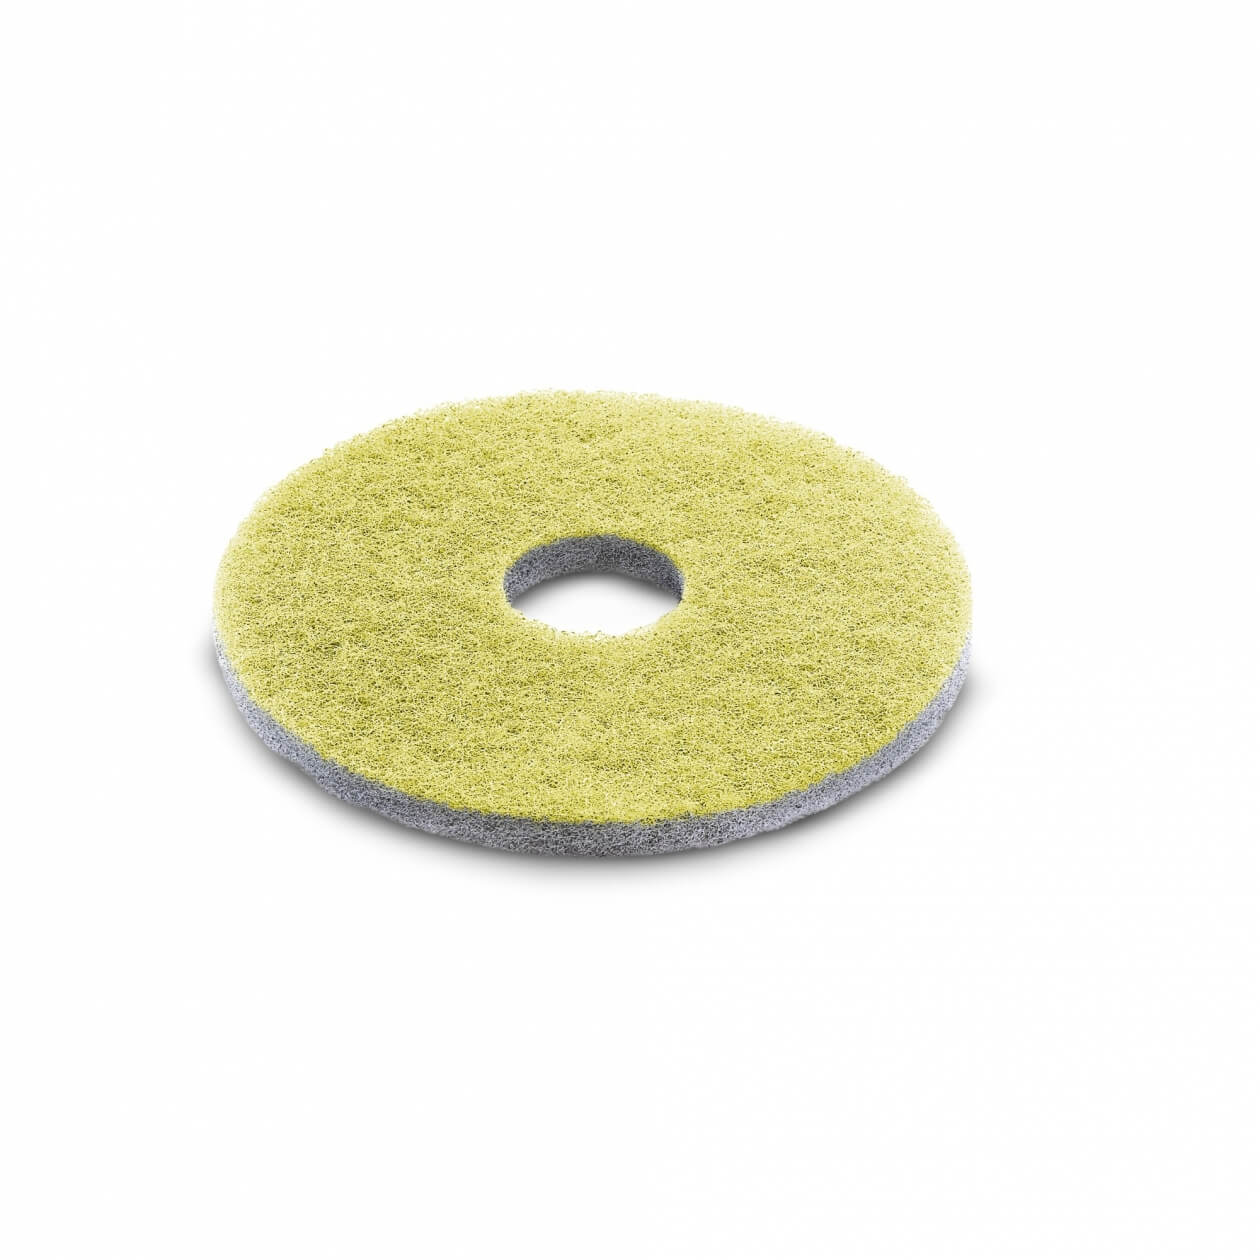 Kärcher, diamantpads, gul, medium, 457 mmm, 5 stk.